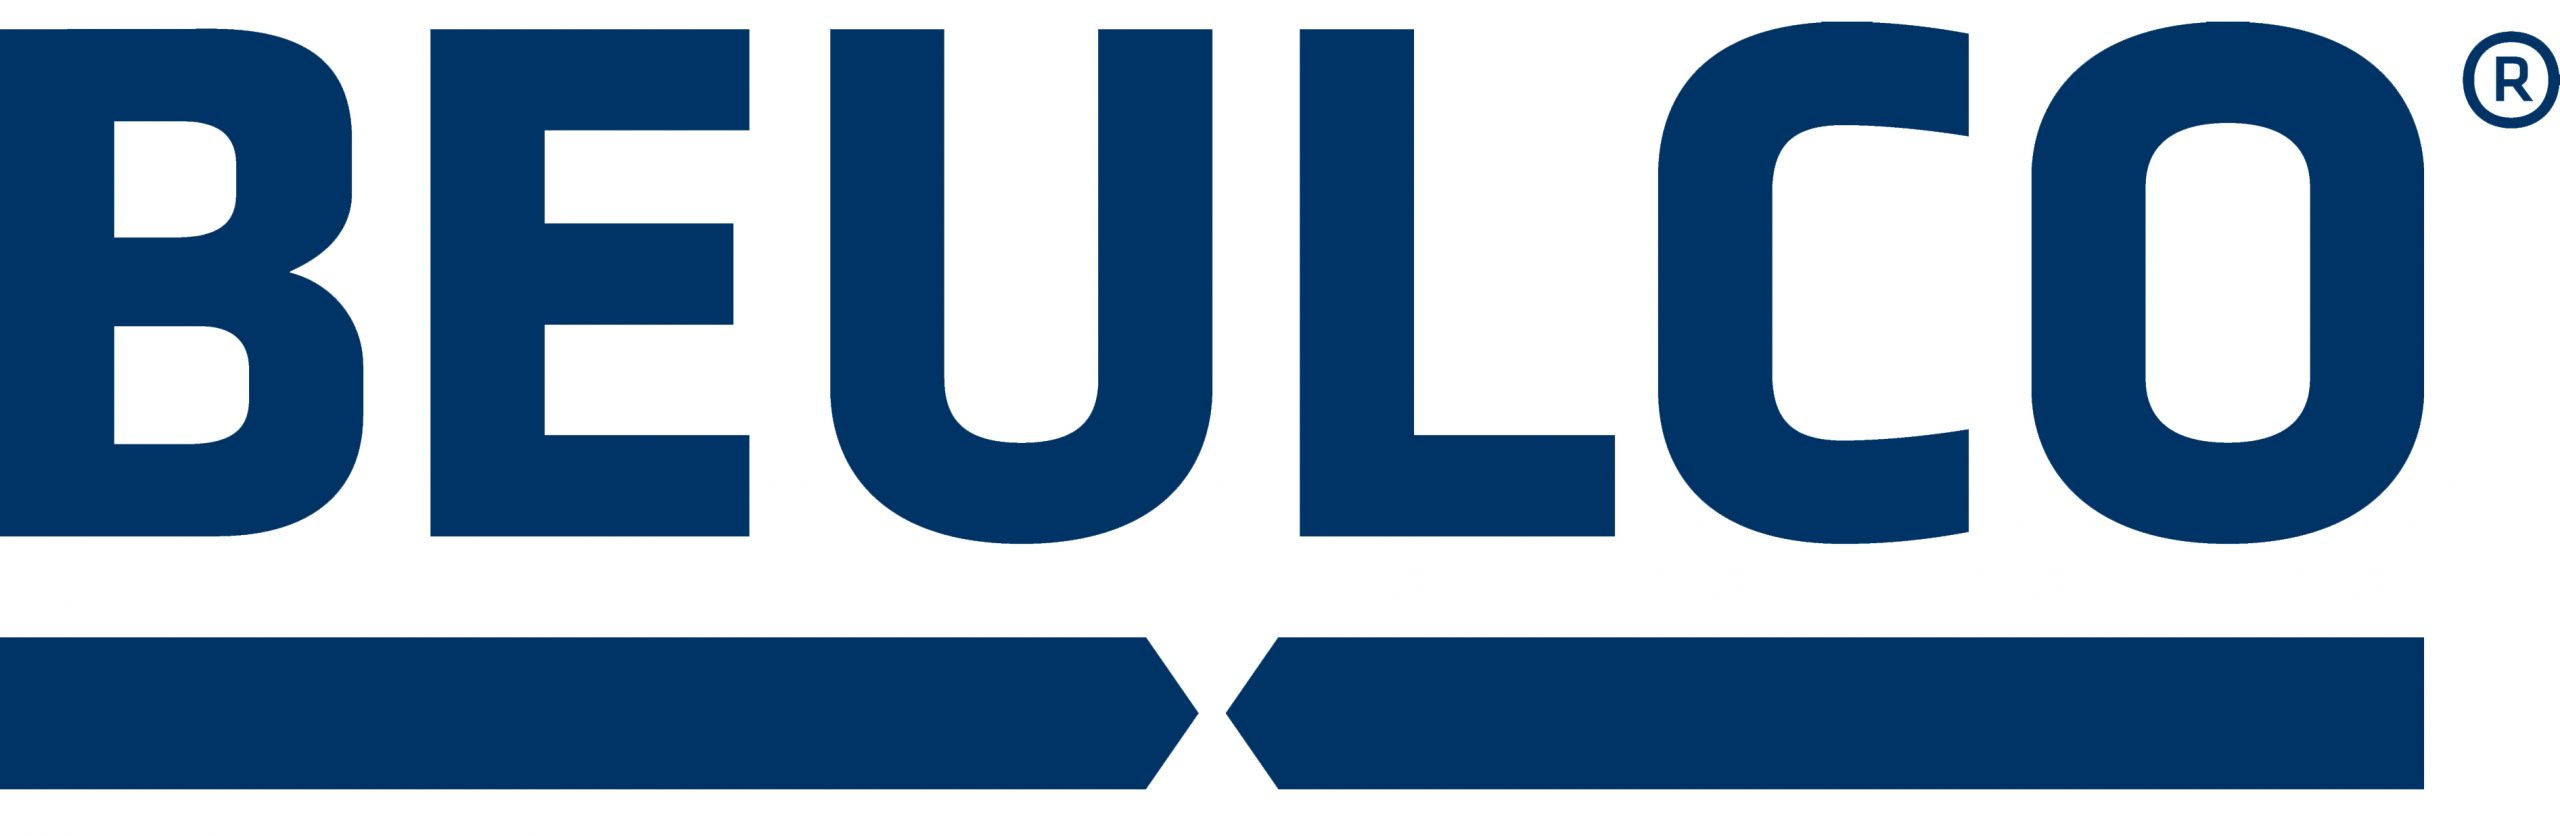 BEULCO-Logo_2018_web-scaled.jpg